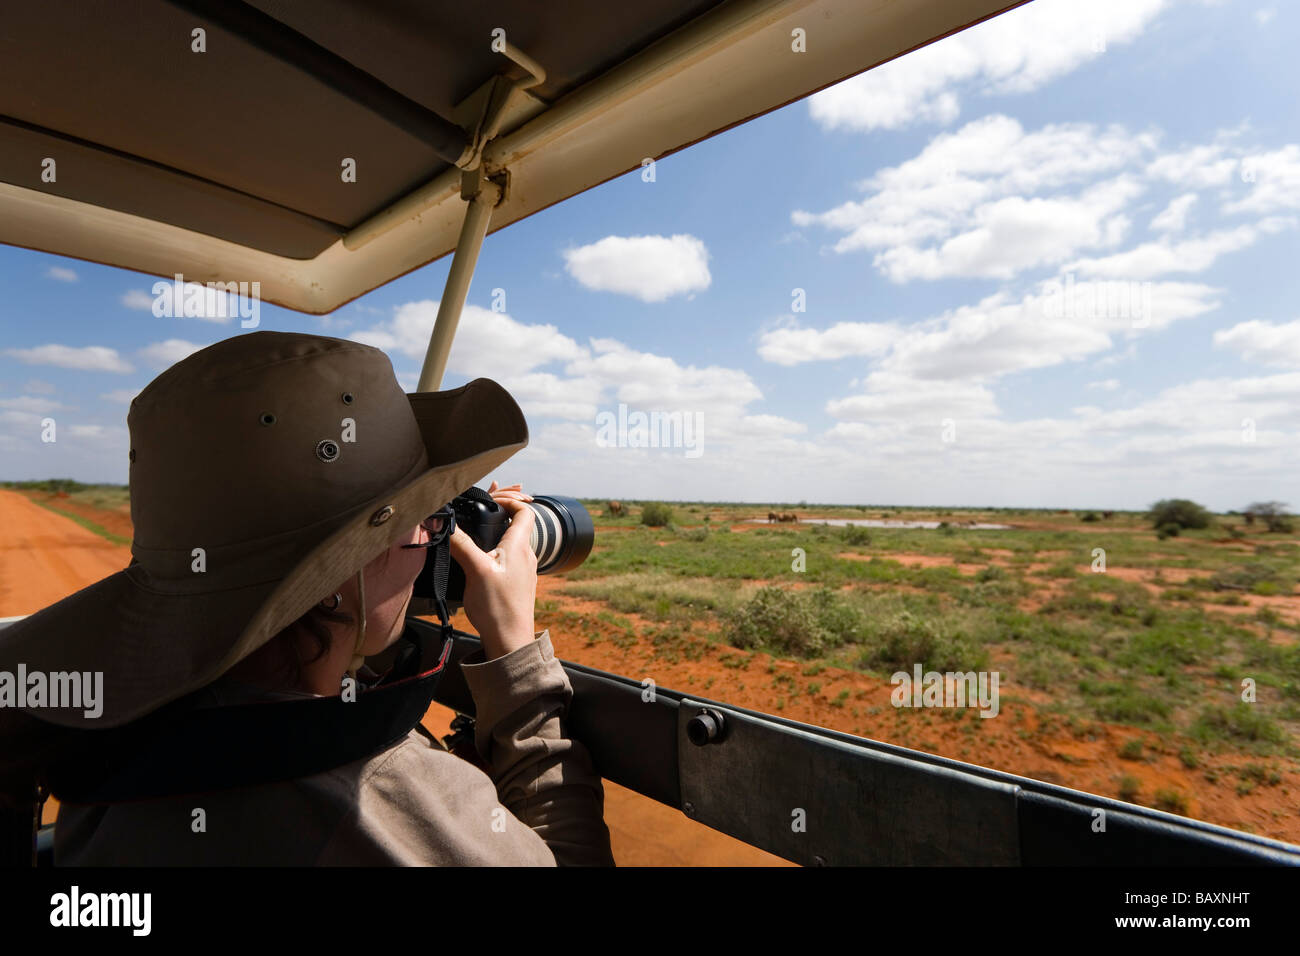 Frau Abfotografier während Safari Tour, Tsavo East National Park, Küste, Kenia Stockbild